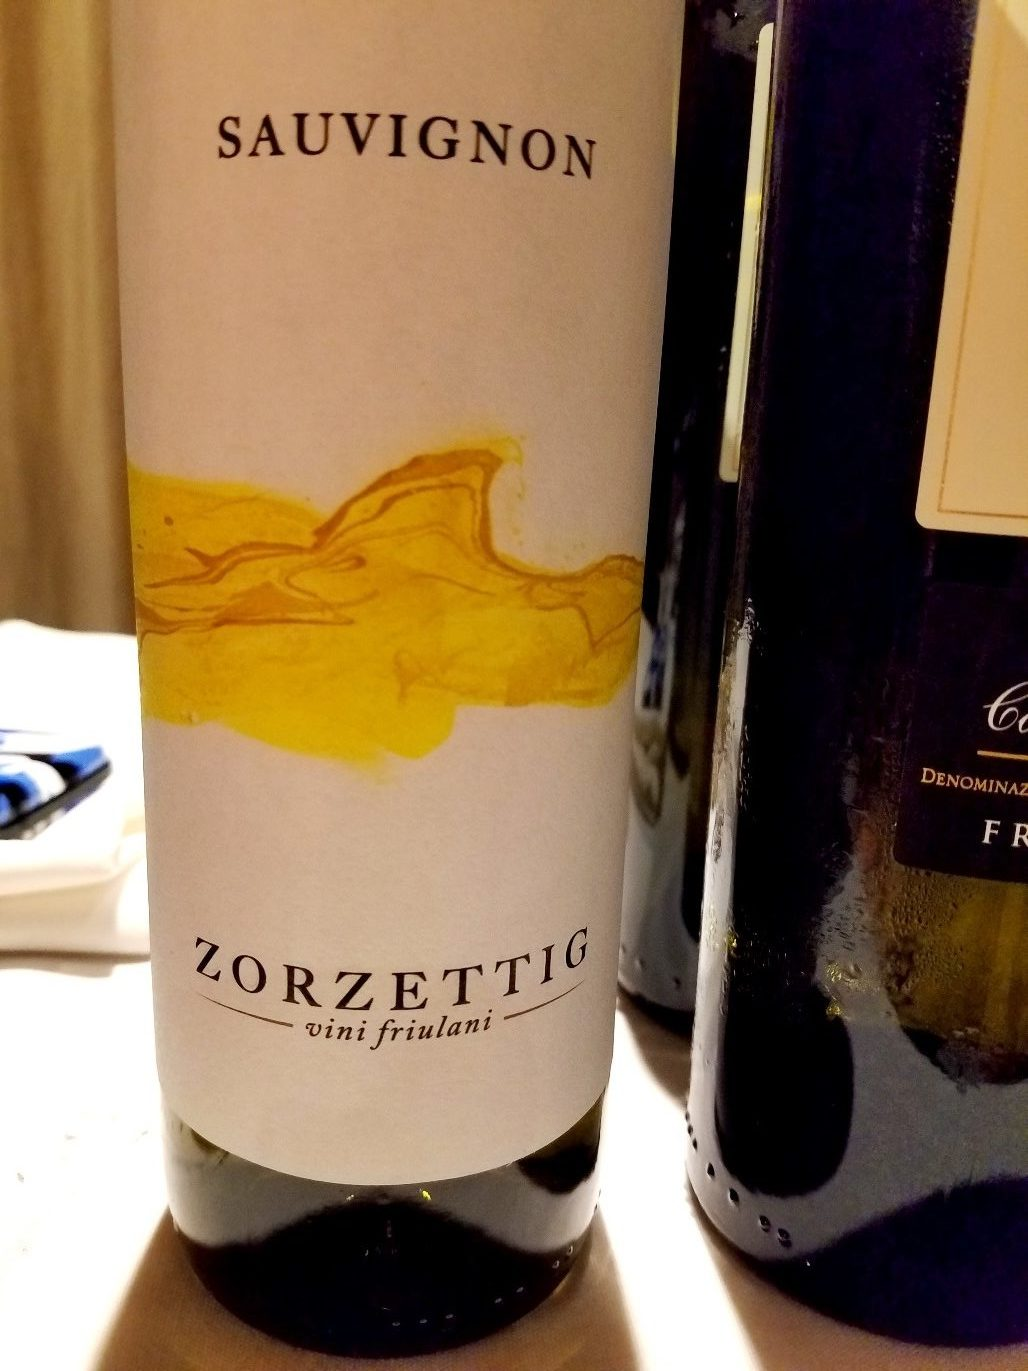 Zorzettig Sauvignon 2018, James Suckling Great Wines of Italy New York 2020, Wine Casual